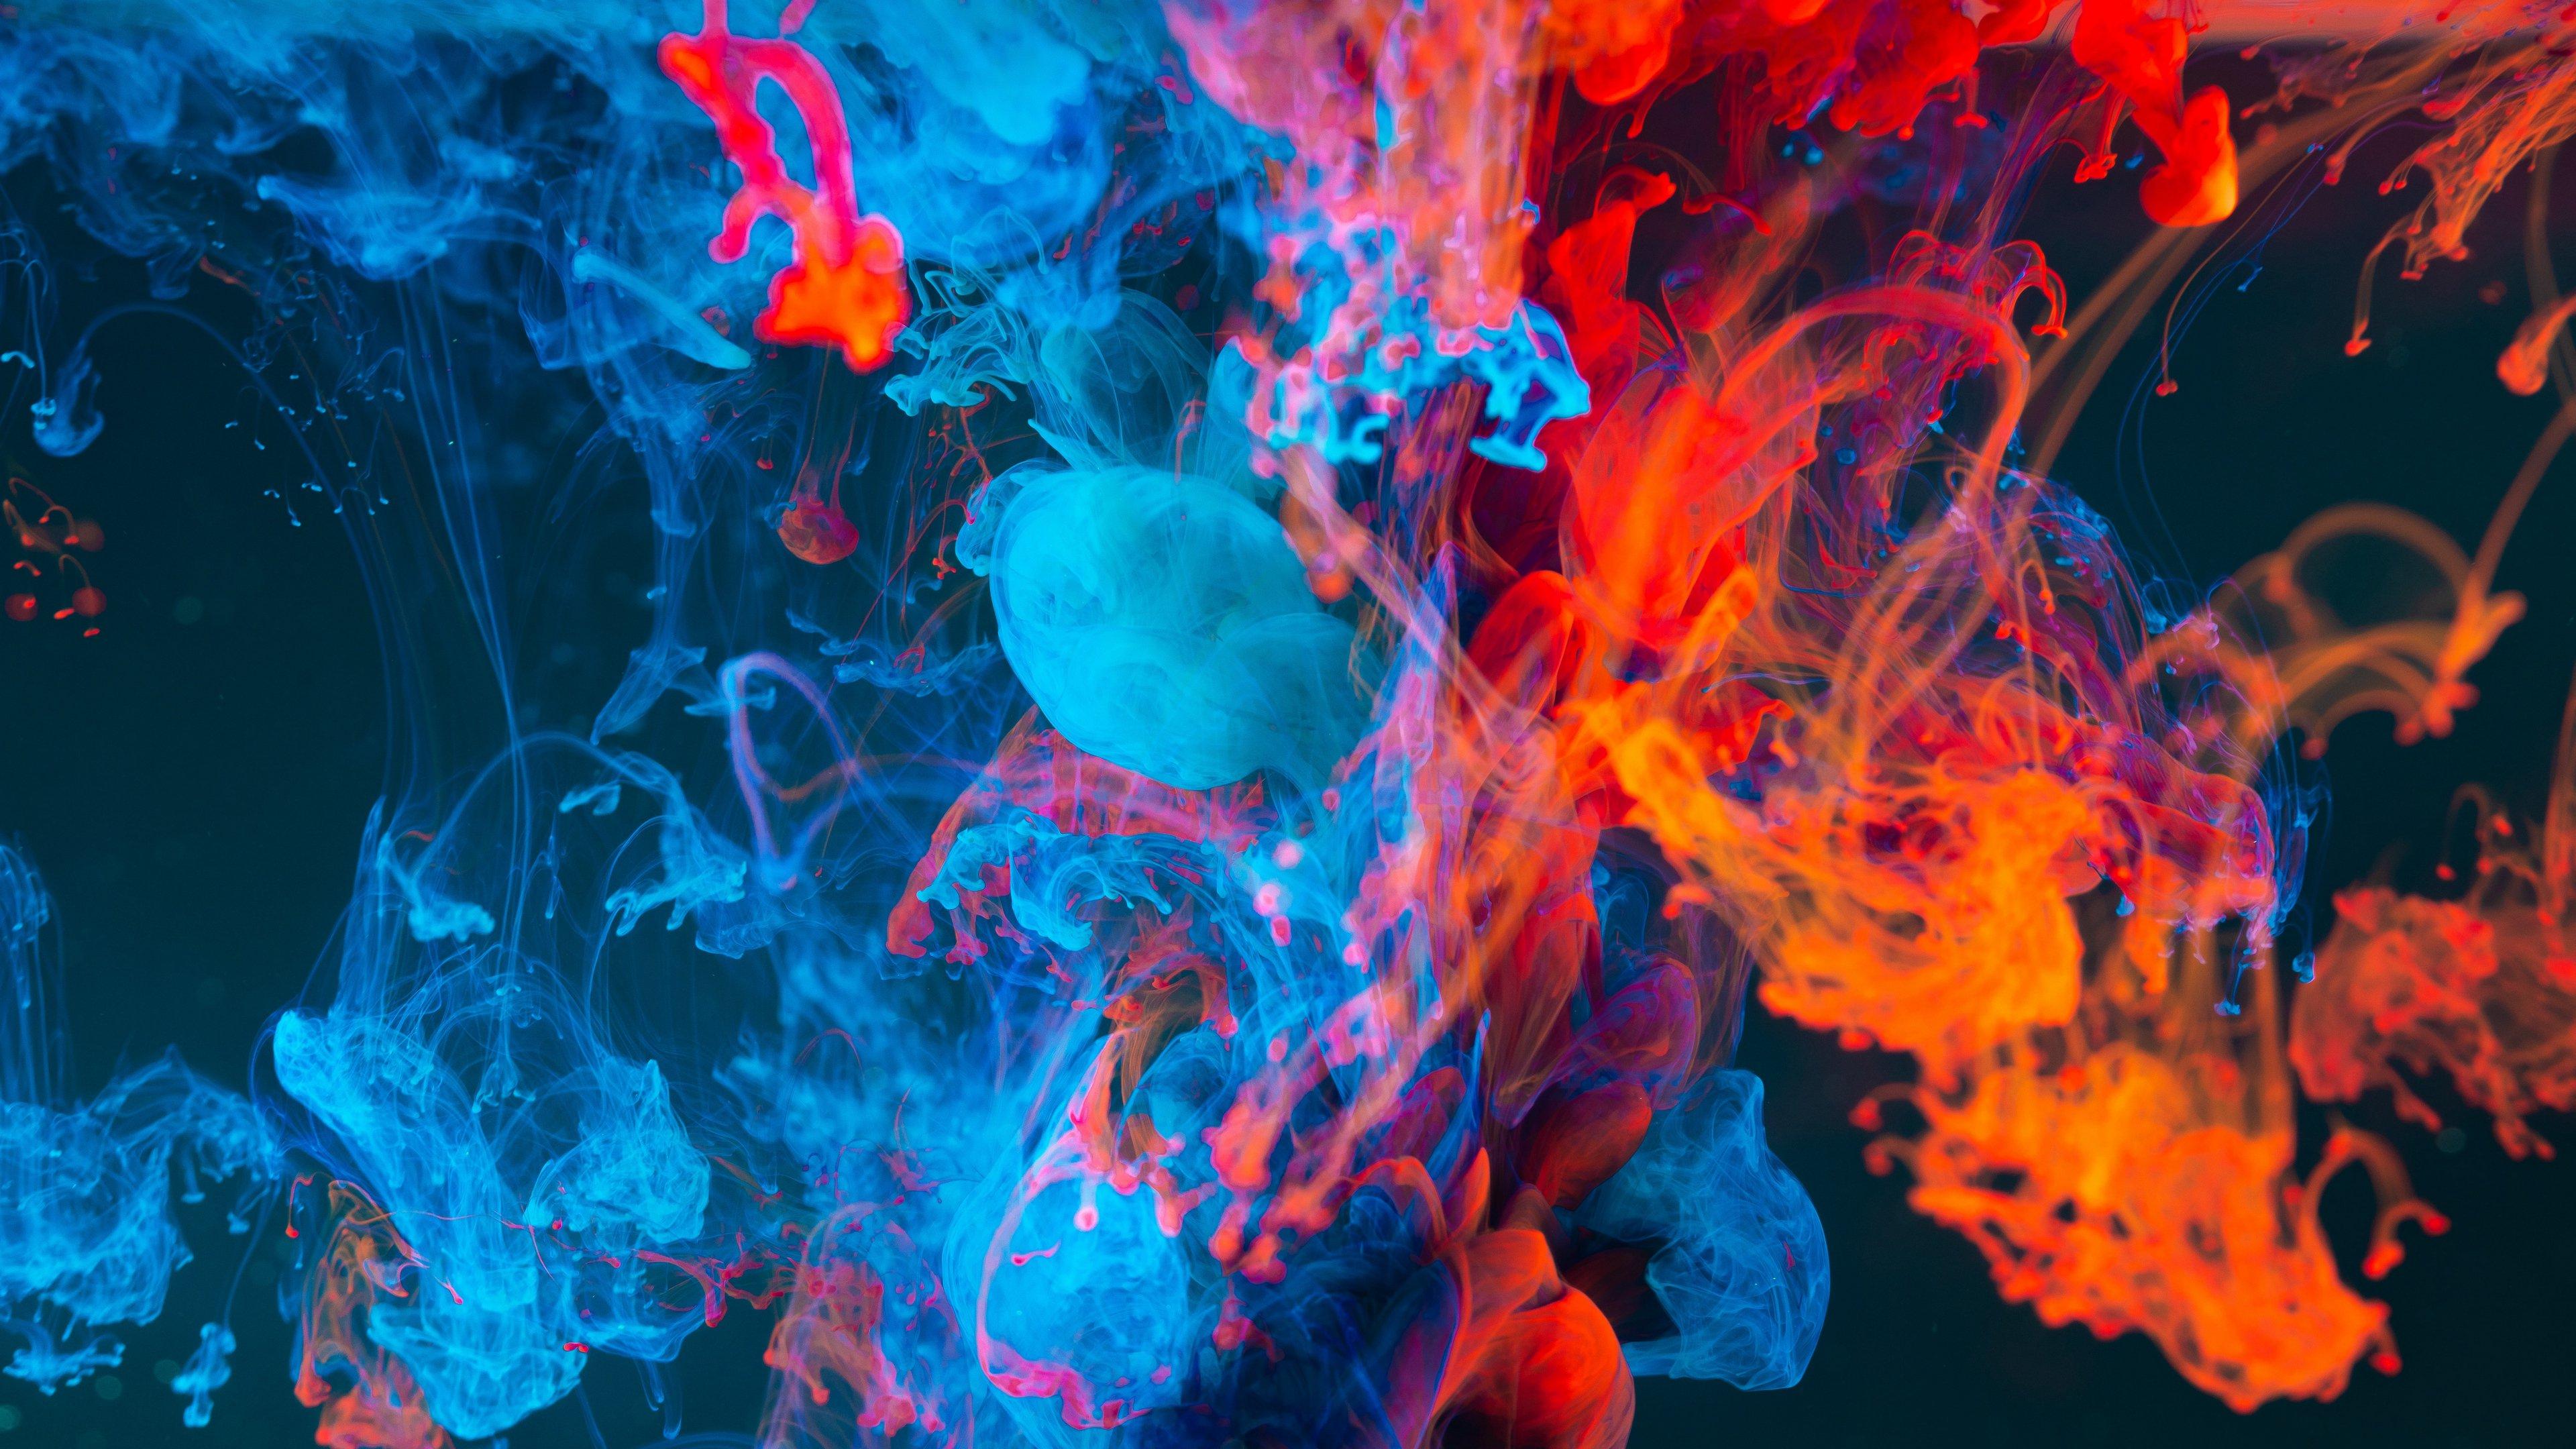 Liquid 4K wallpapers for your desktop or mobile screen ...